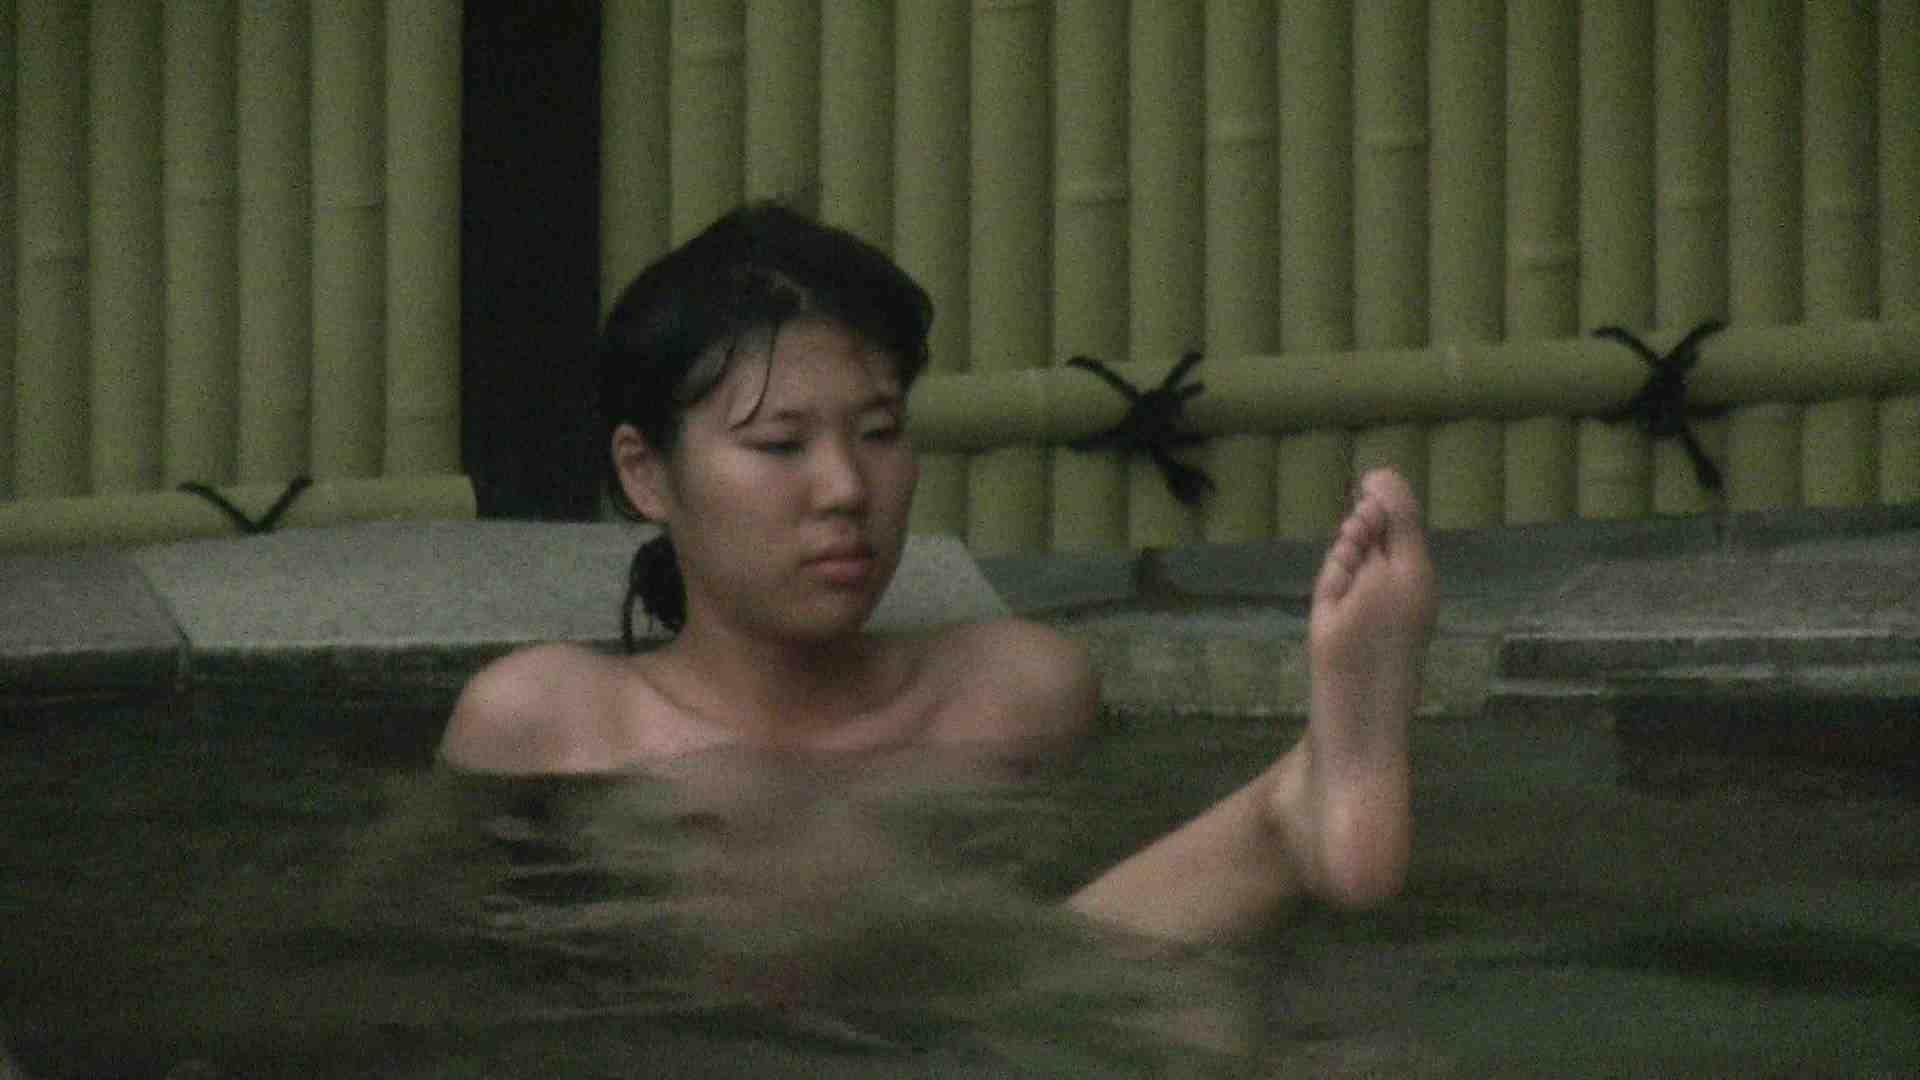 Aquaな露天風呂Vol.215 綺麗なOLたち  106枚 39